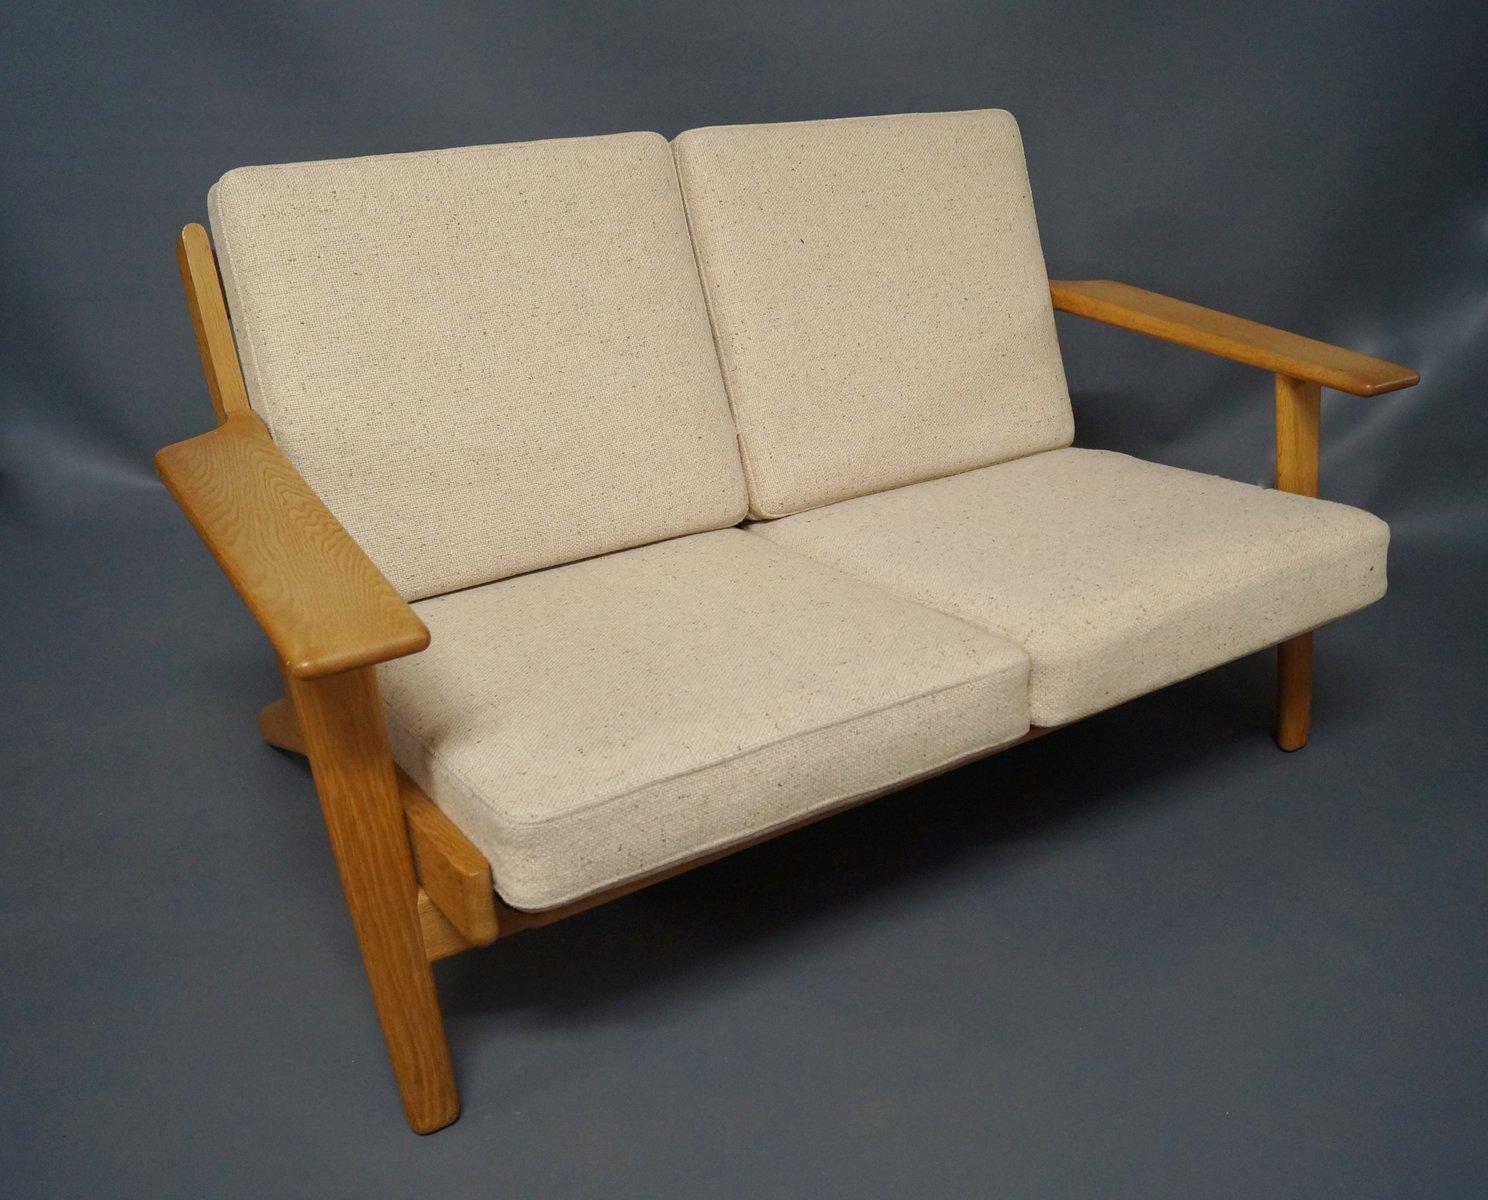 GE 290 Two Seater Sofa By Hans J. Wegner For Getama, 1960s